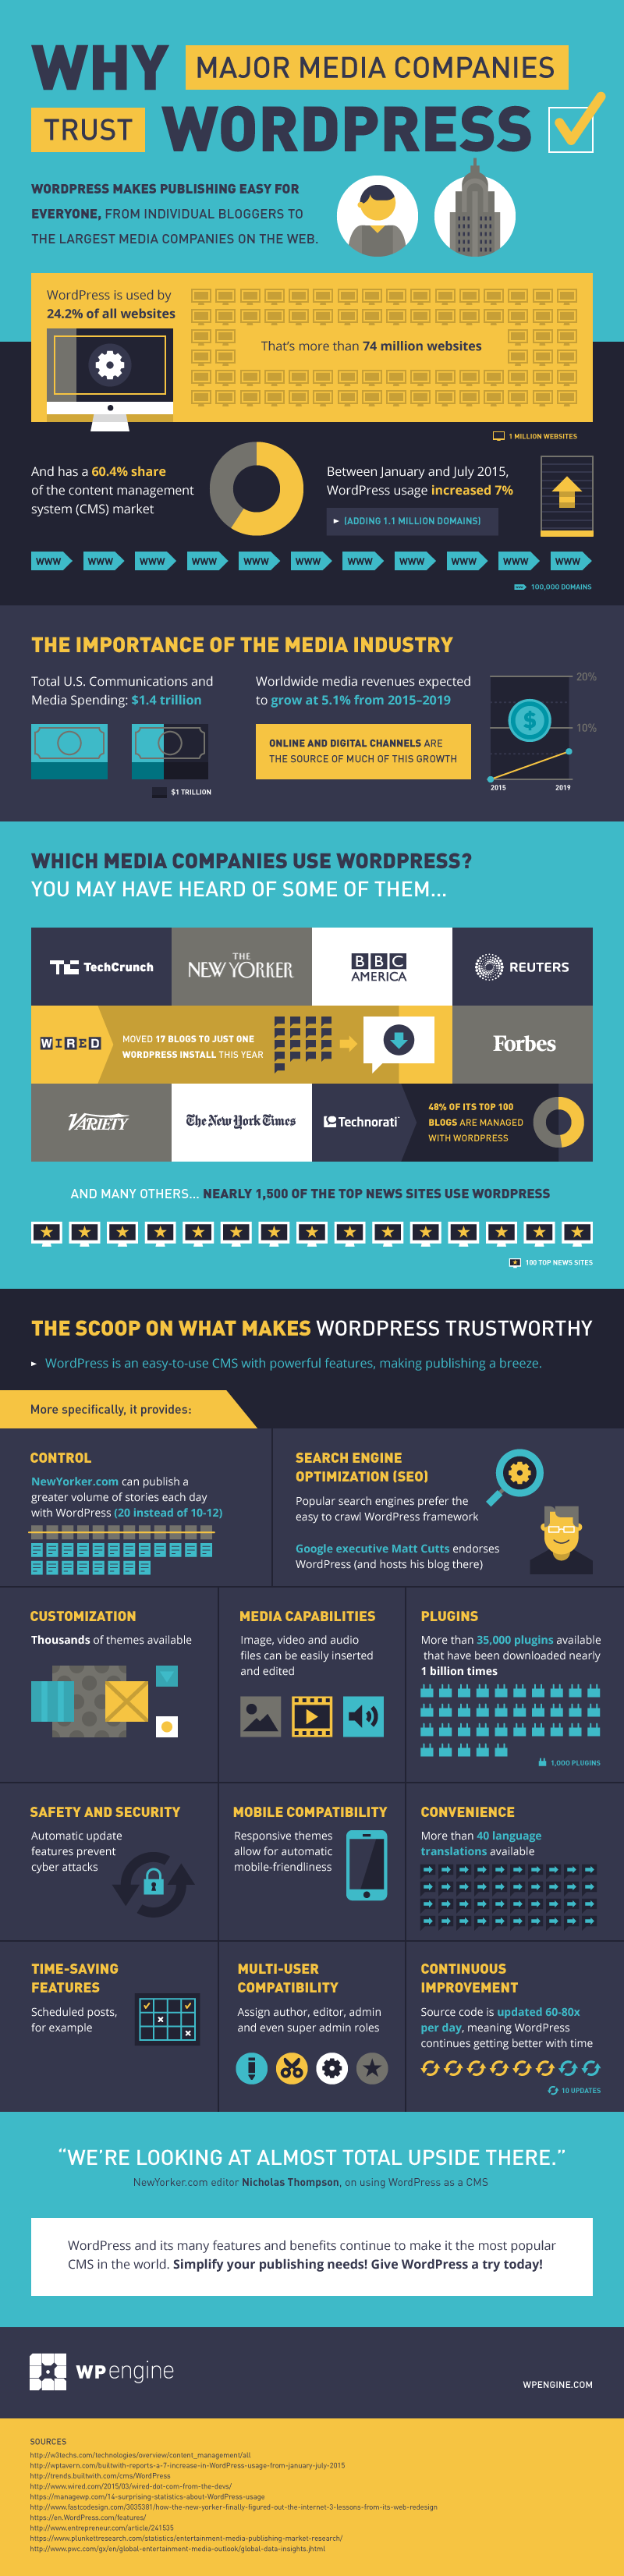 Wordpress and Media Industry